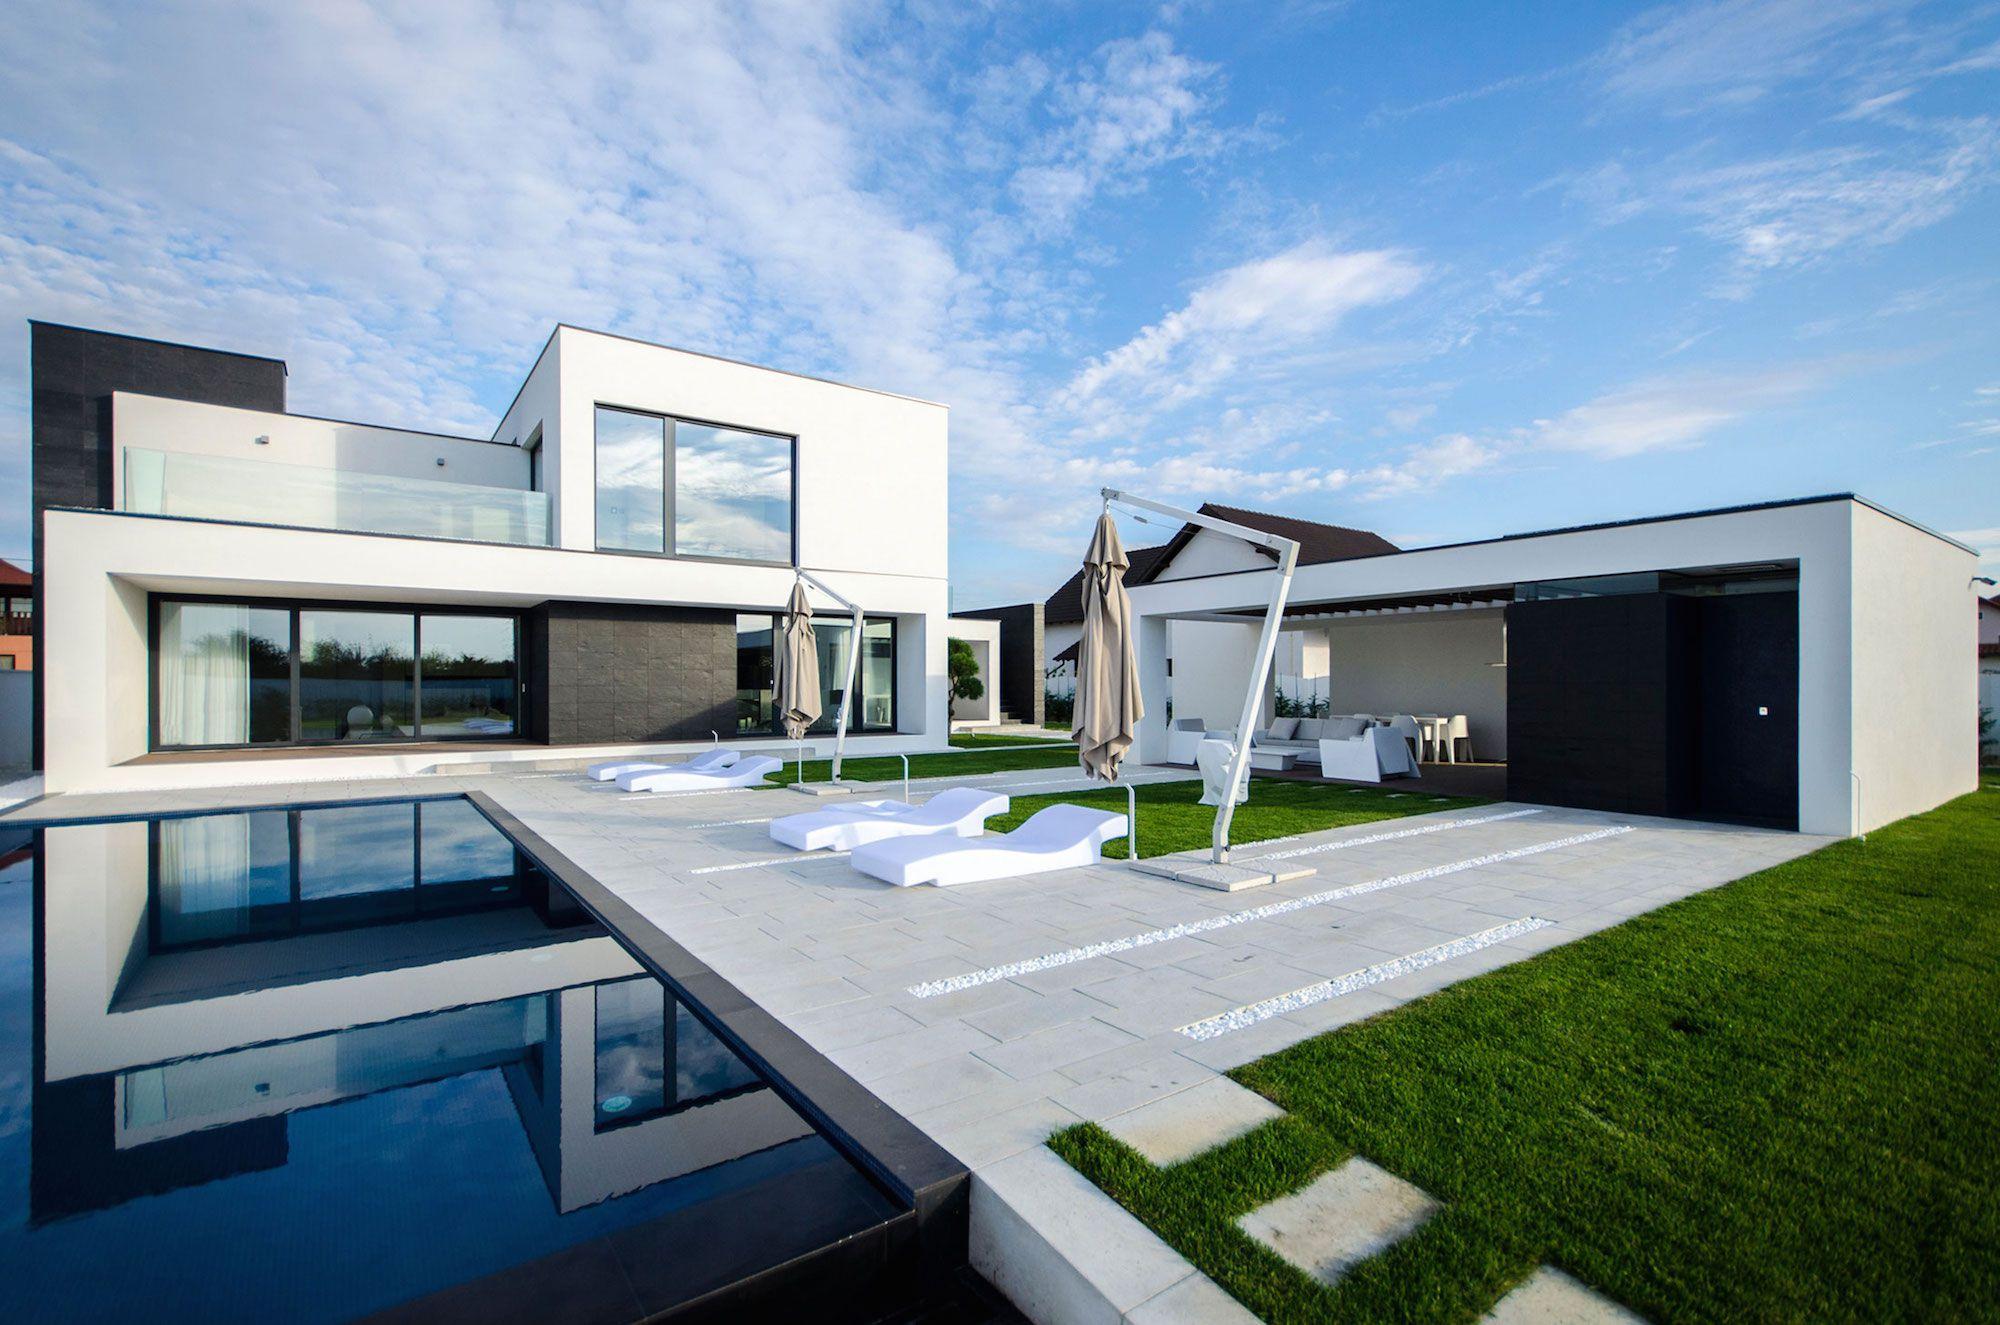 Ultramodern C House in Timisoara by Parasite Studio CAANdesign